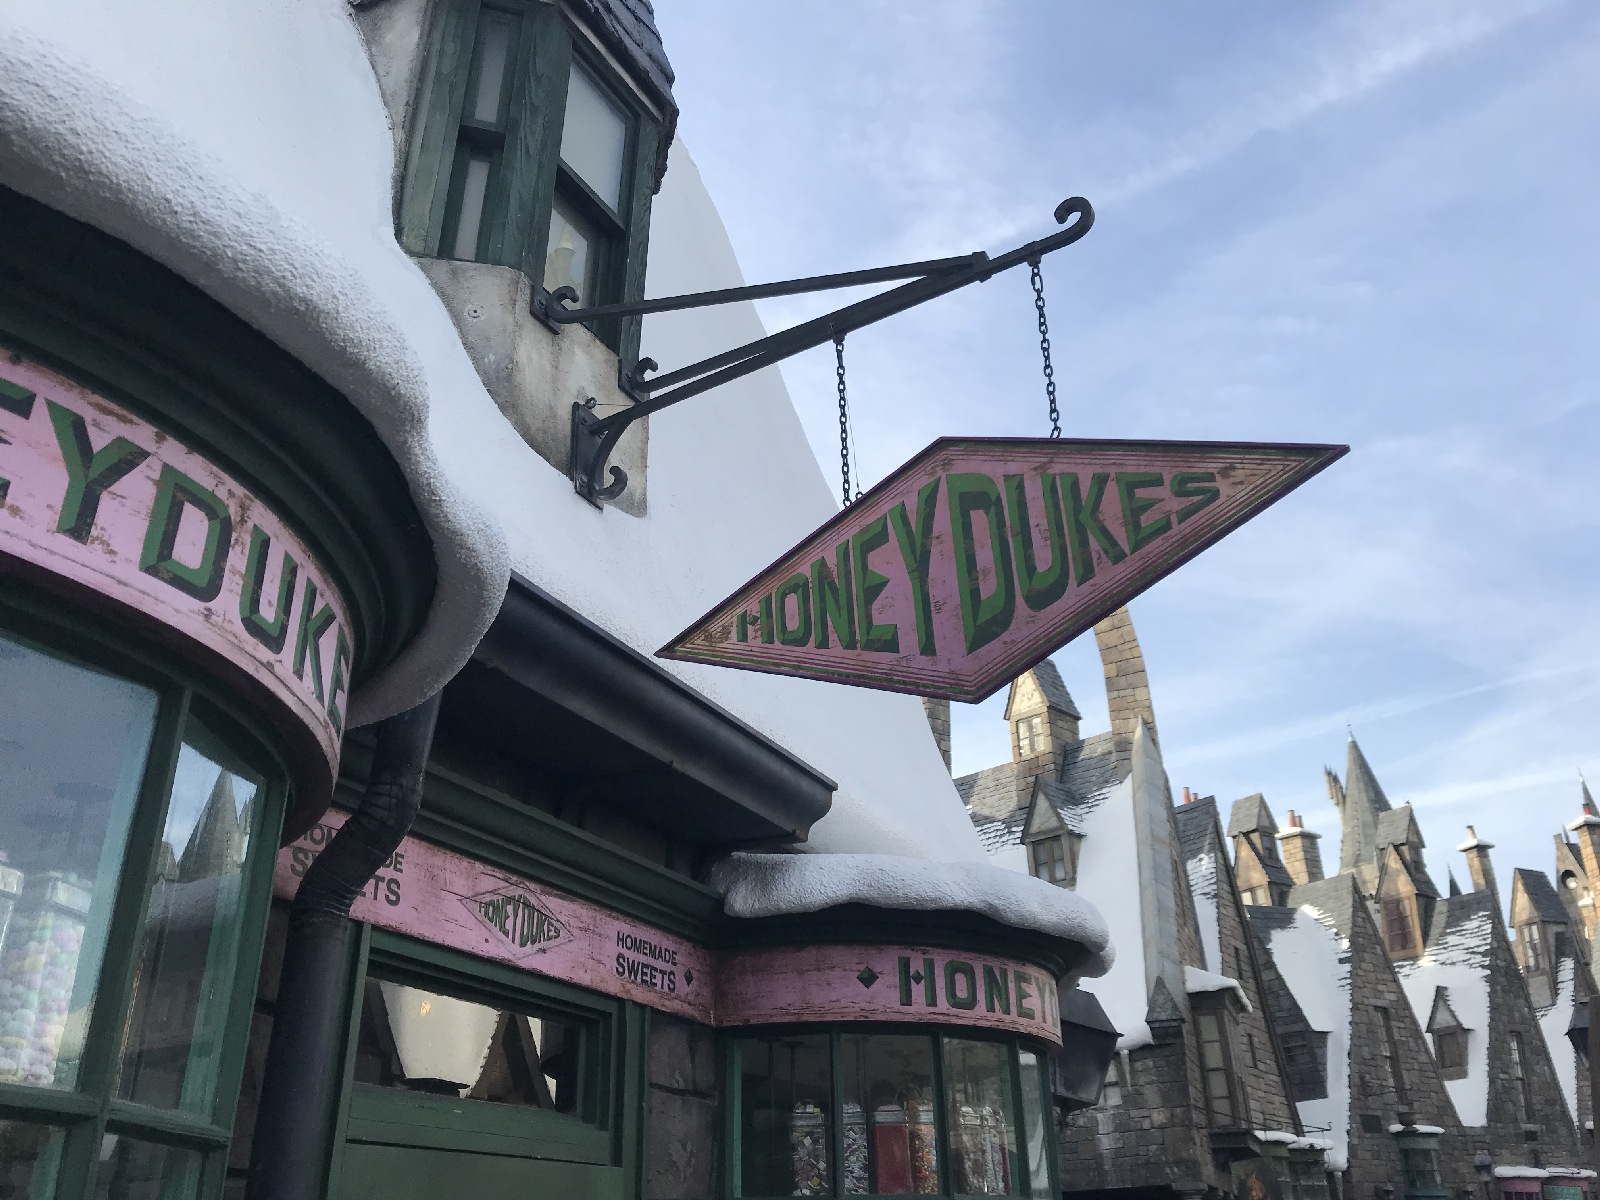 Honeydukes Guide To Harry Potter World In Universal Studios, Orlando